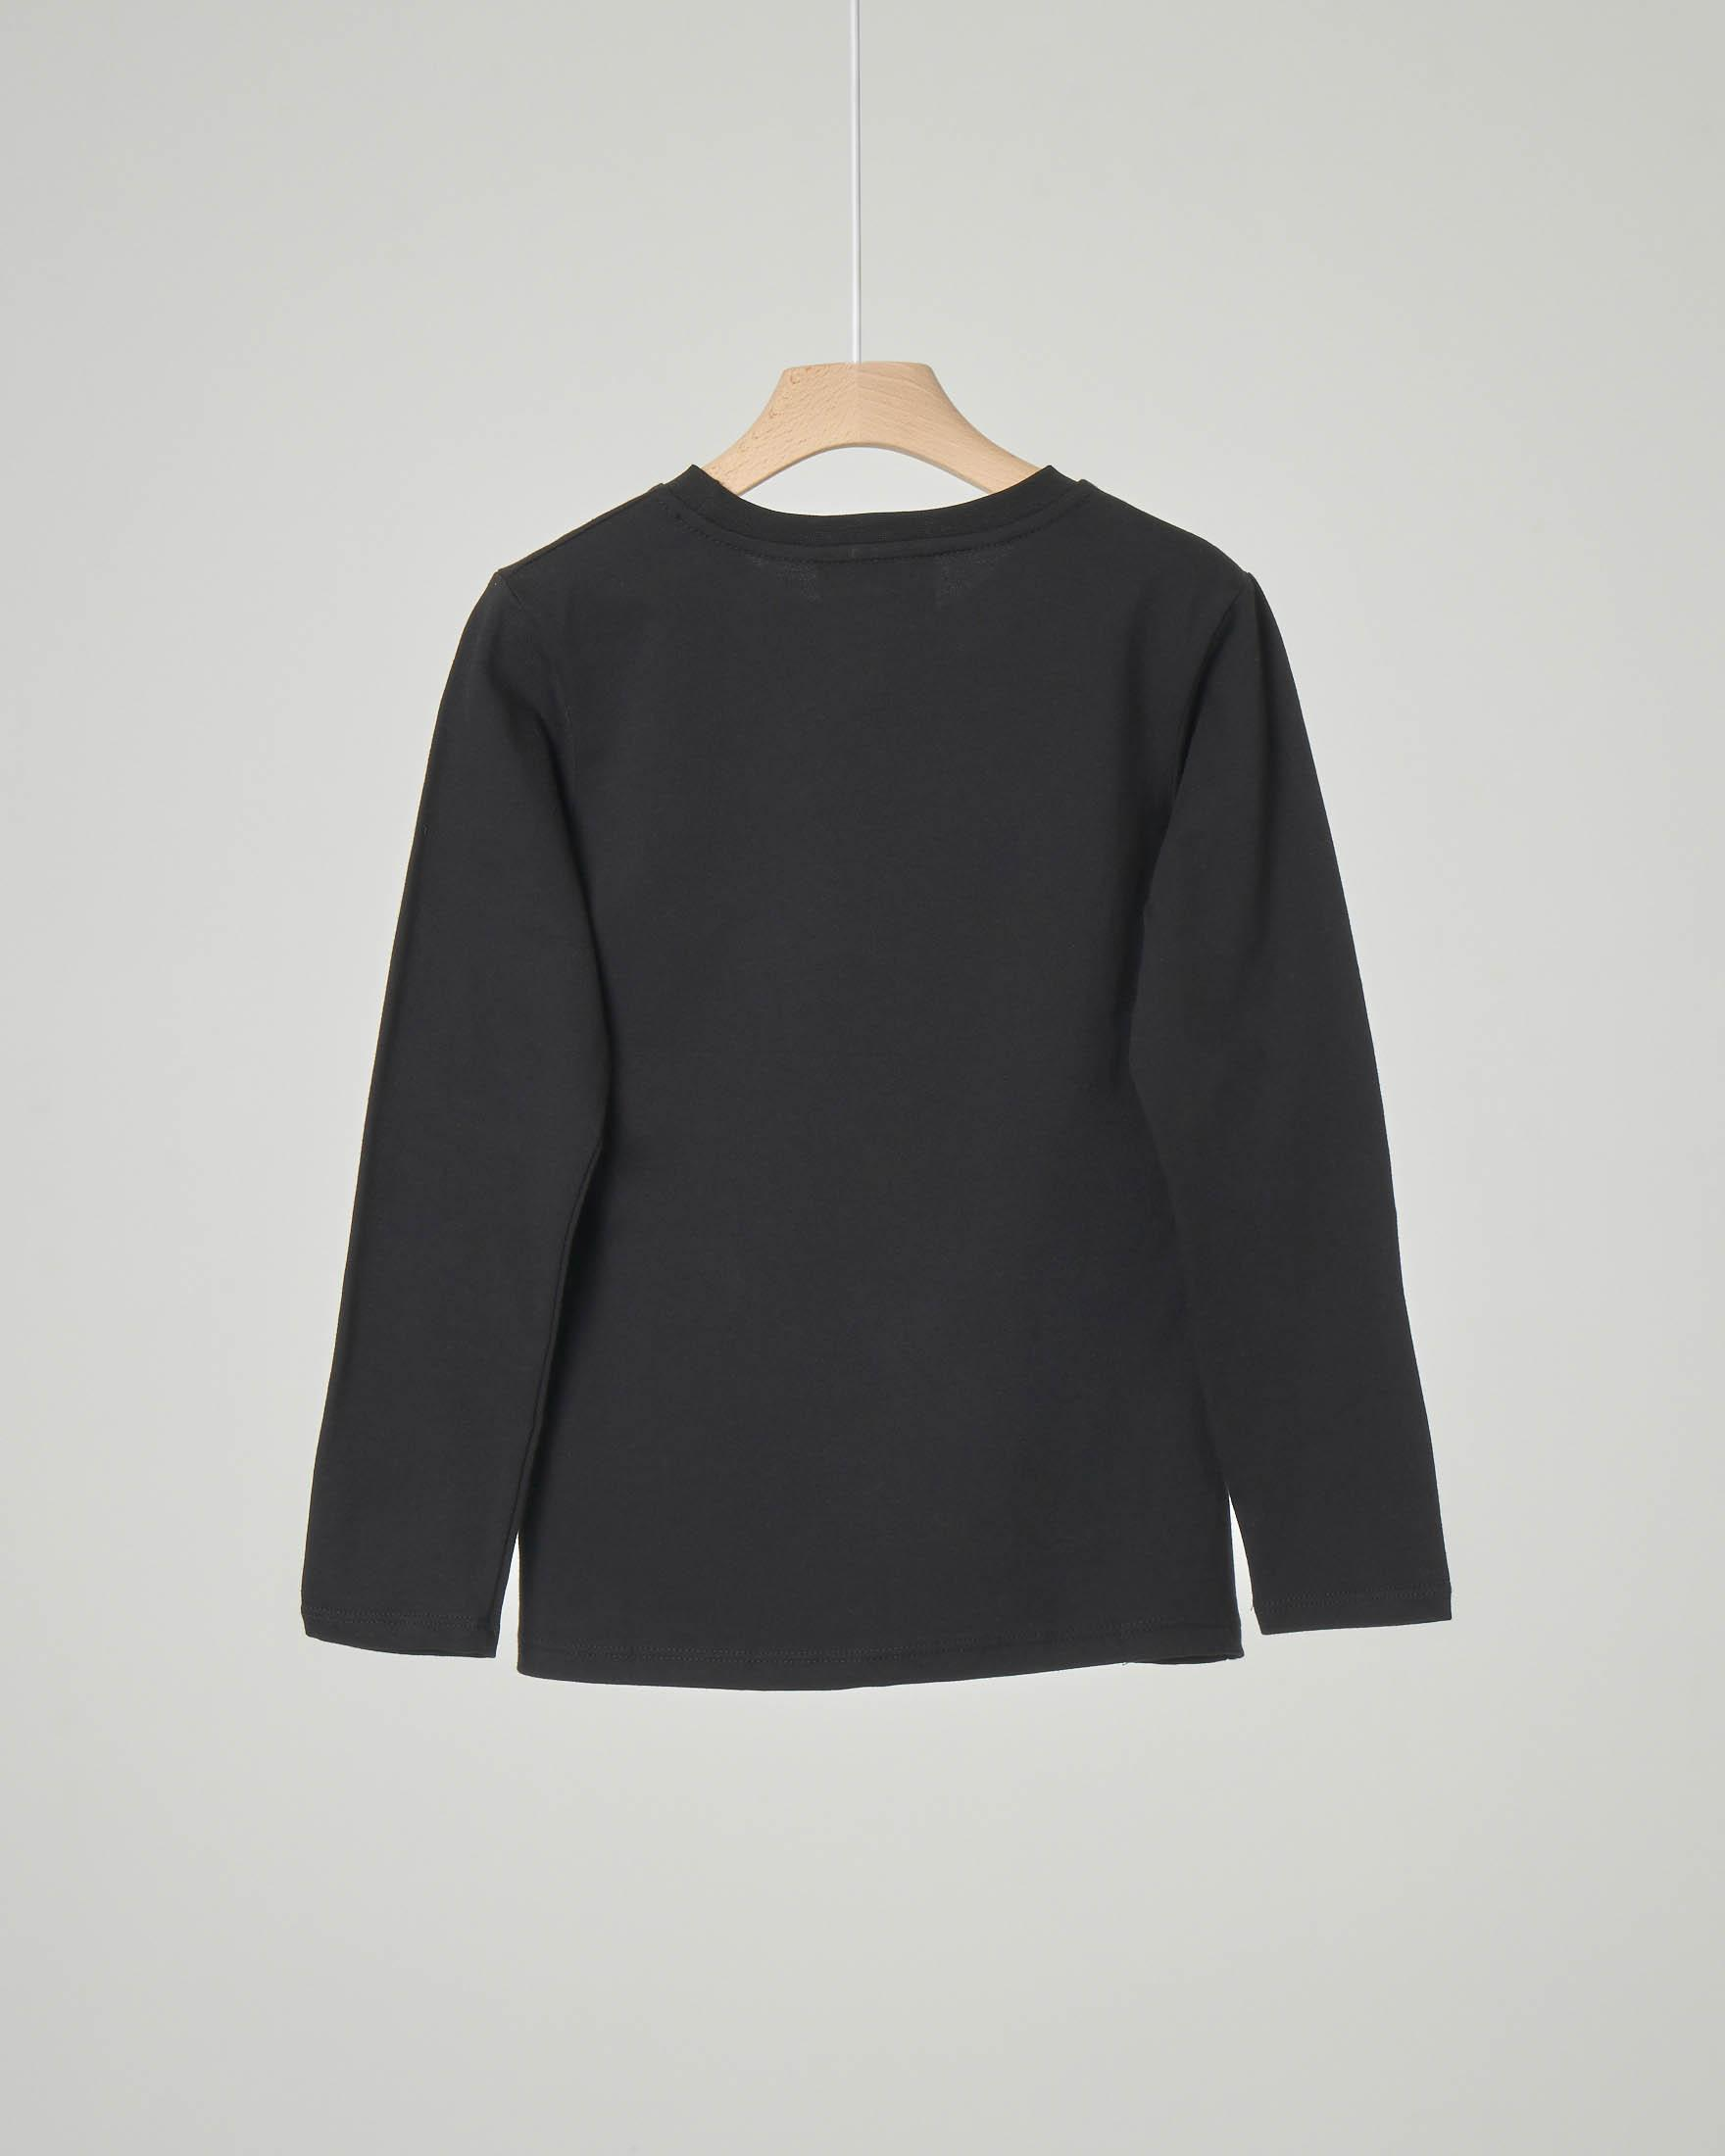 T-shirt nera manica lunga con logo in glitter argento XS-S